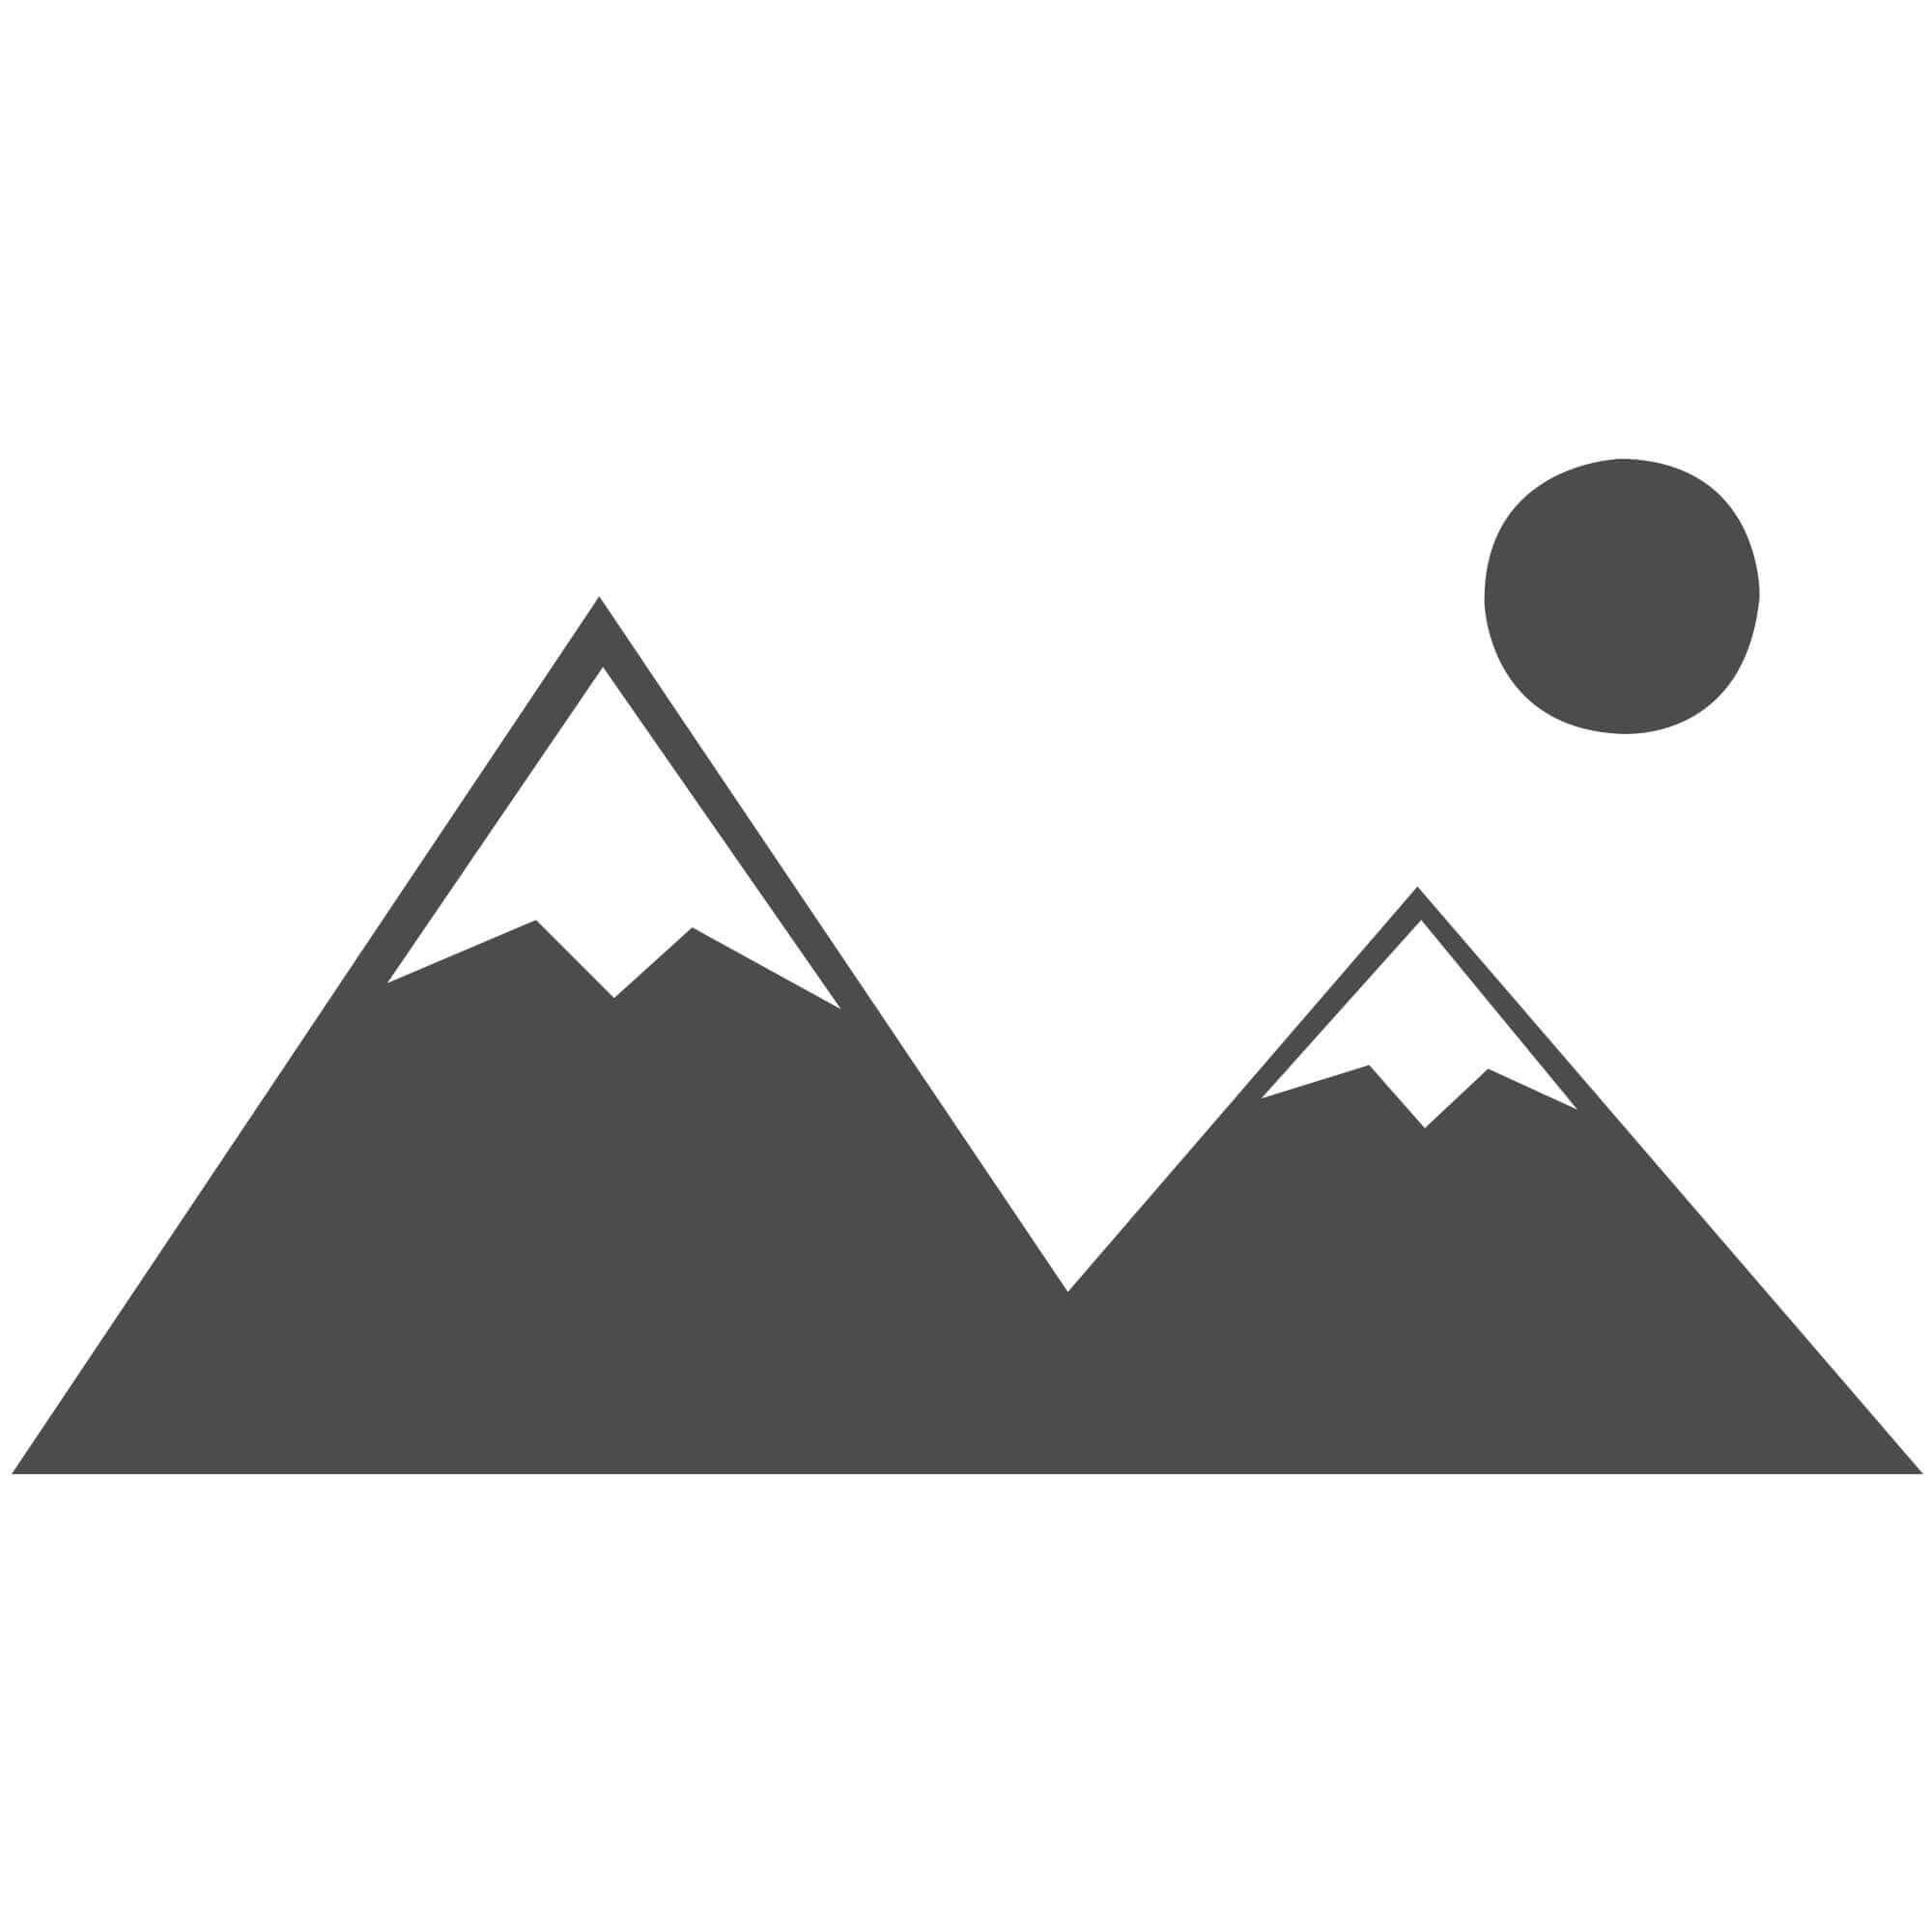 "Cascade Shaggy Rug - Violet - Size 120 x 170 cm (4' x 5'7"")"